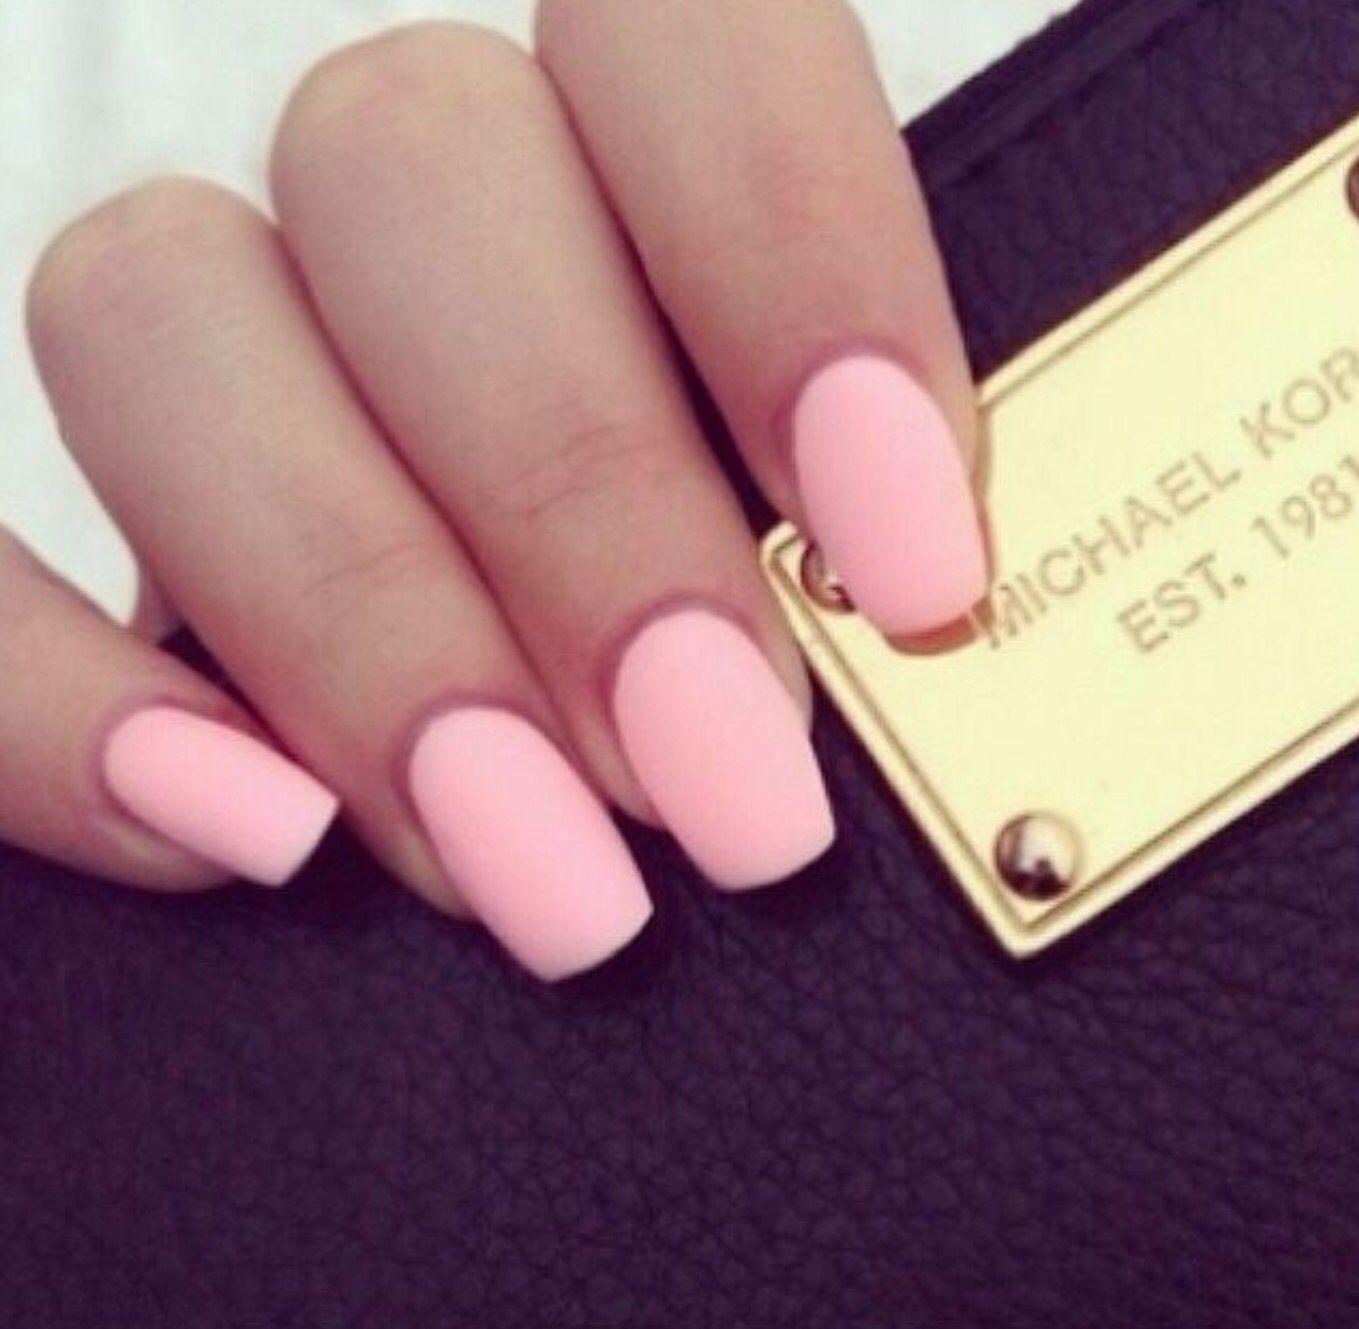 Beautiful matte baby pink nails | Simple nails | Pinterest ...